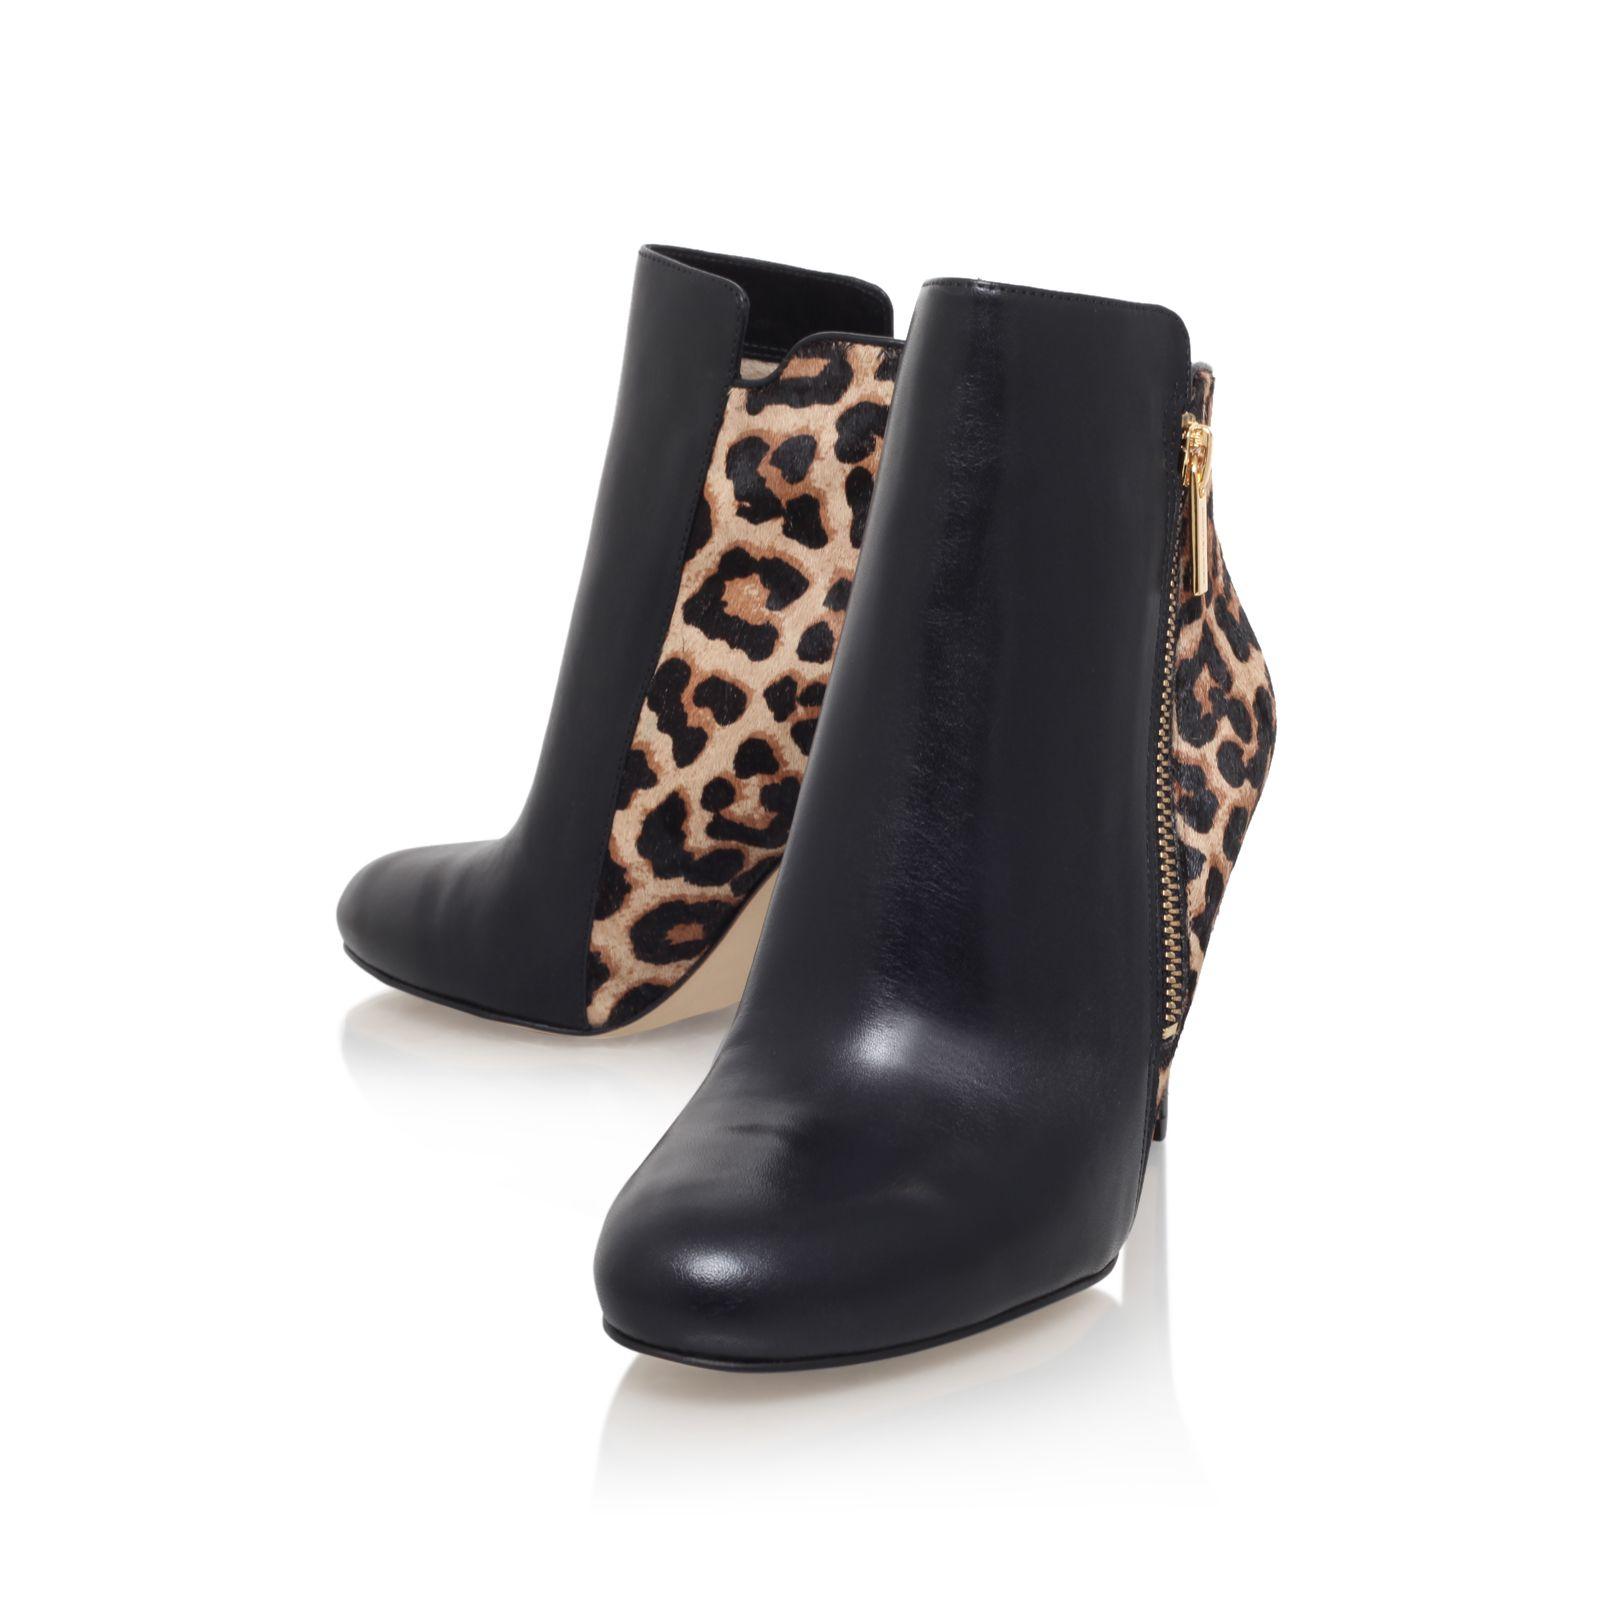 michael kors clara ankle high heel ankle boots in black lyst. Black Bedroom Furniture Sets. Home Design Ideas